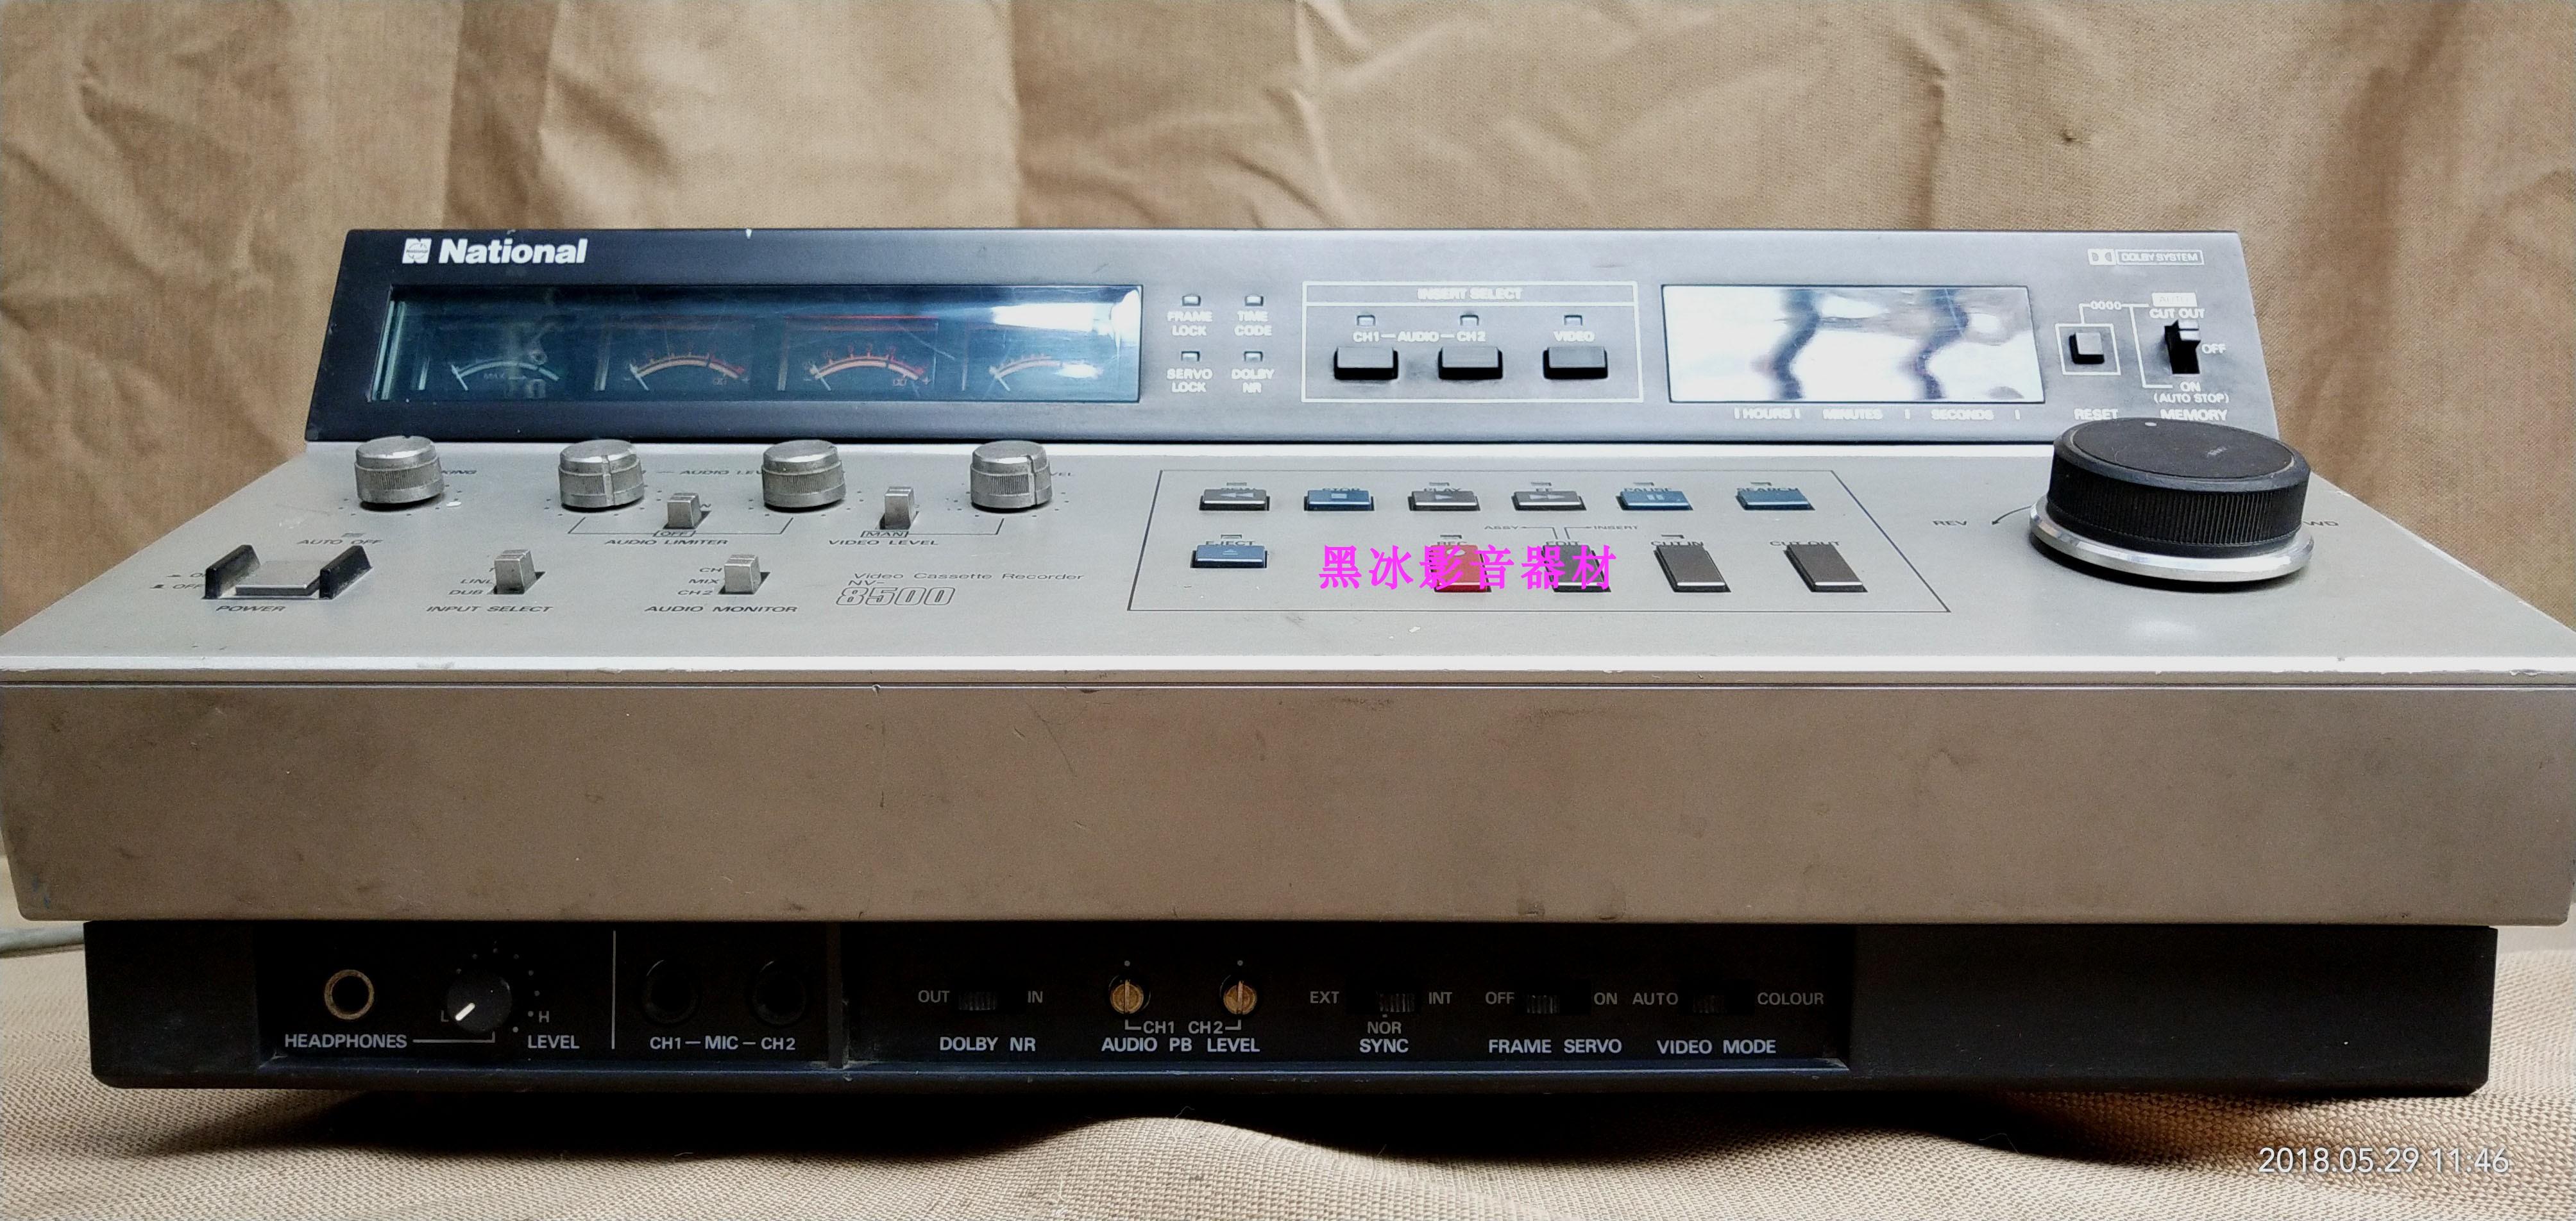 National松下VHS立体声录像机NV-8500EN老录影机做工扎实紧凑